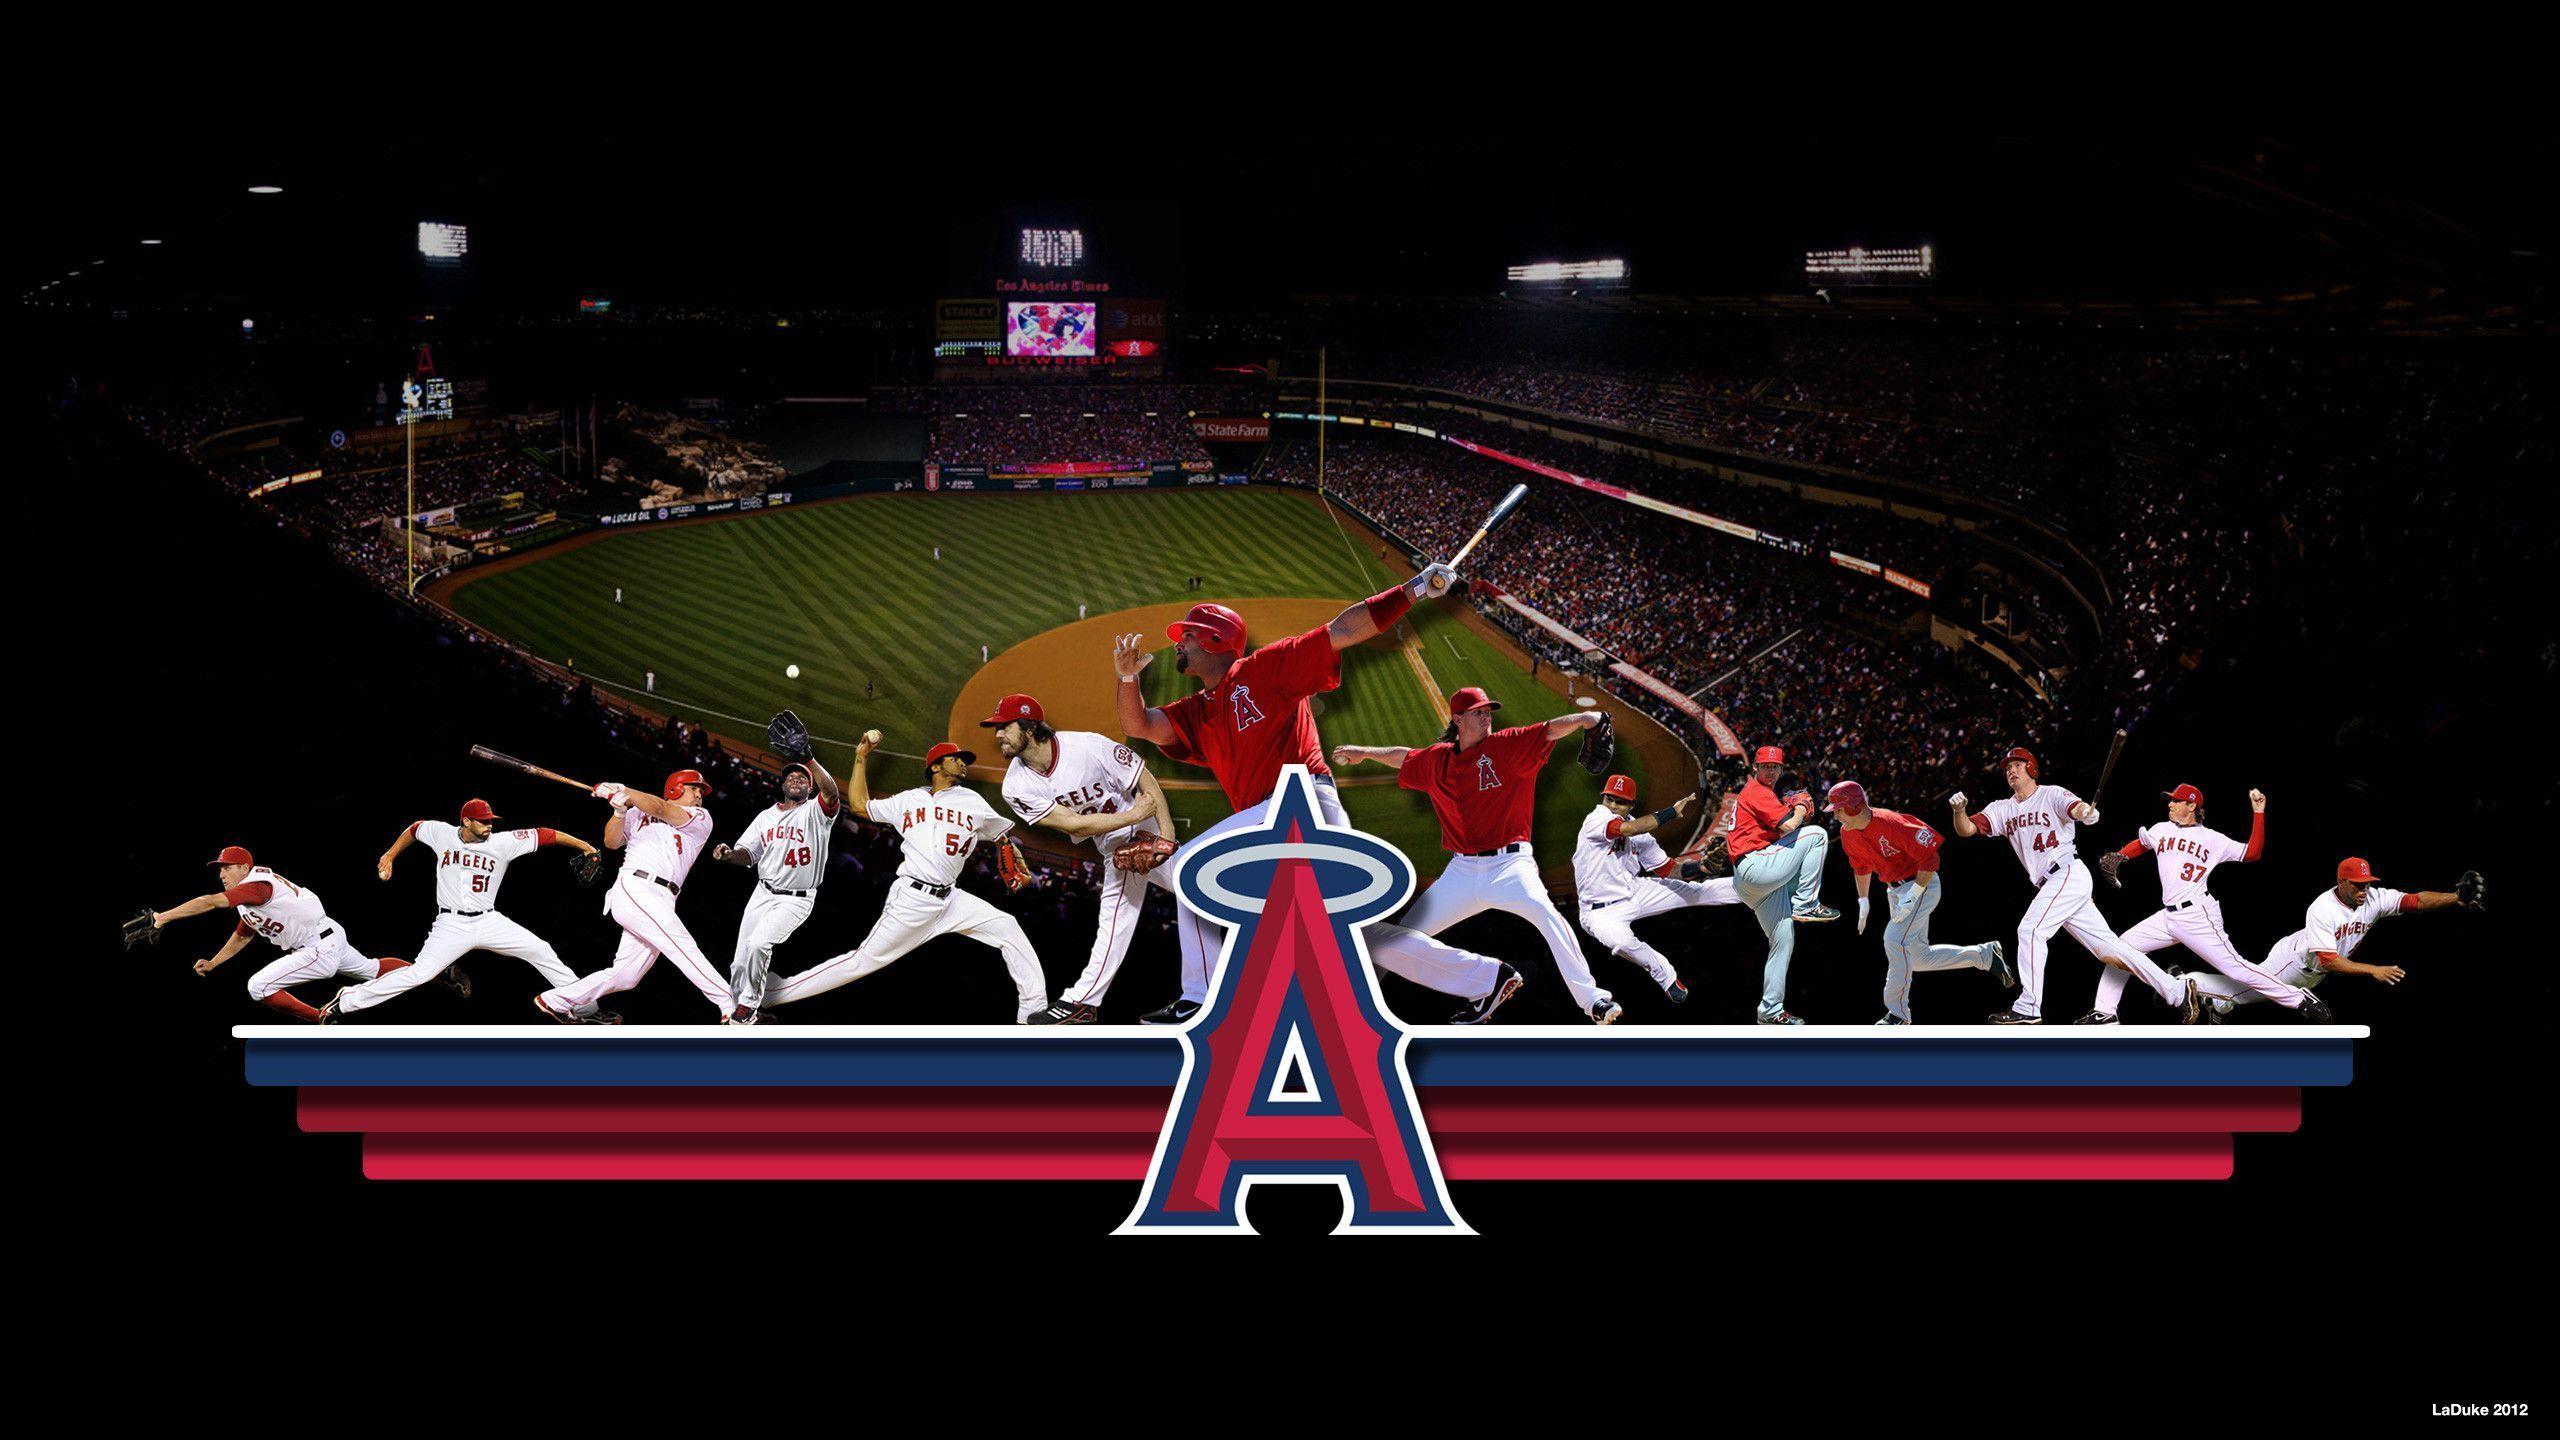 F2ldfak Jpg 2560 1440 Baseball Wallpaper Angels Baseball Los Angeles Angels